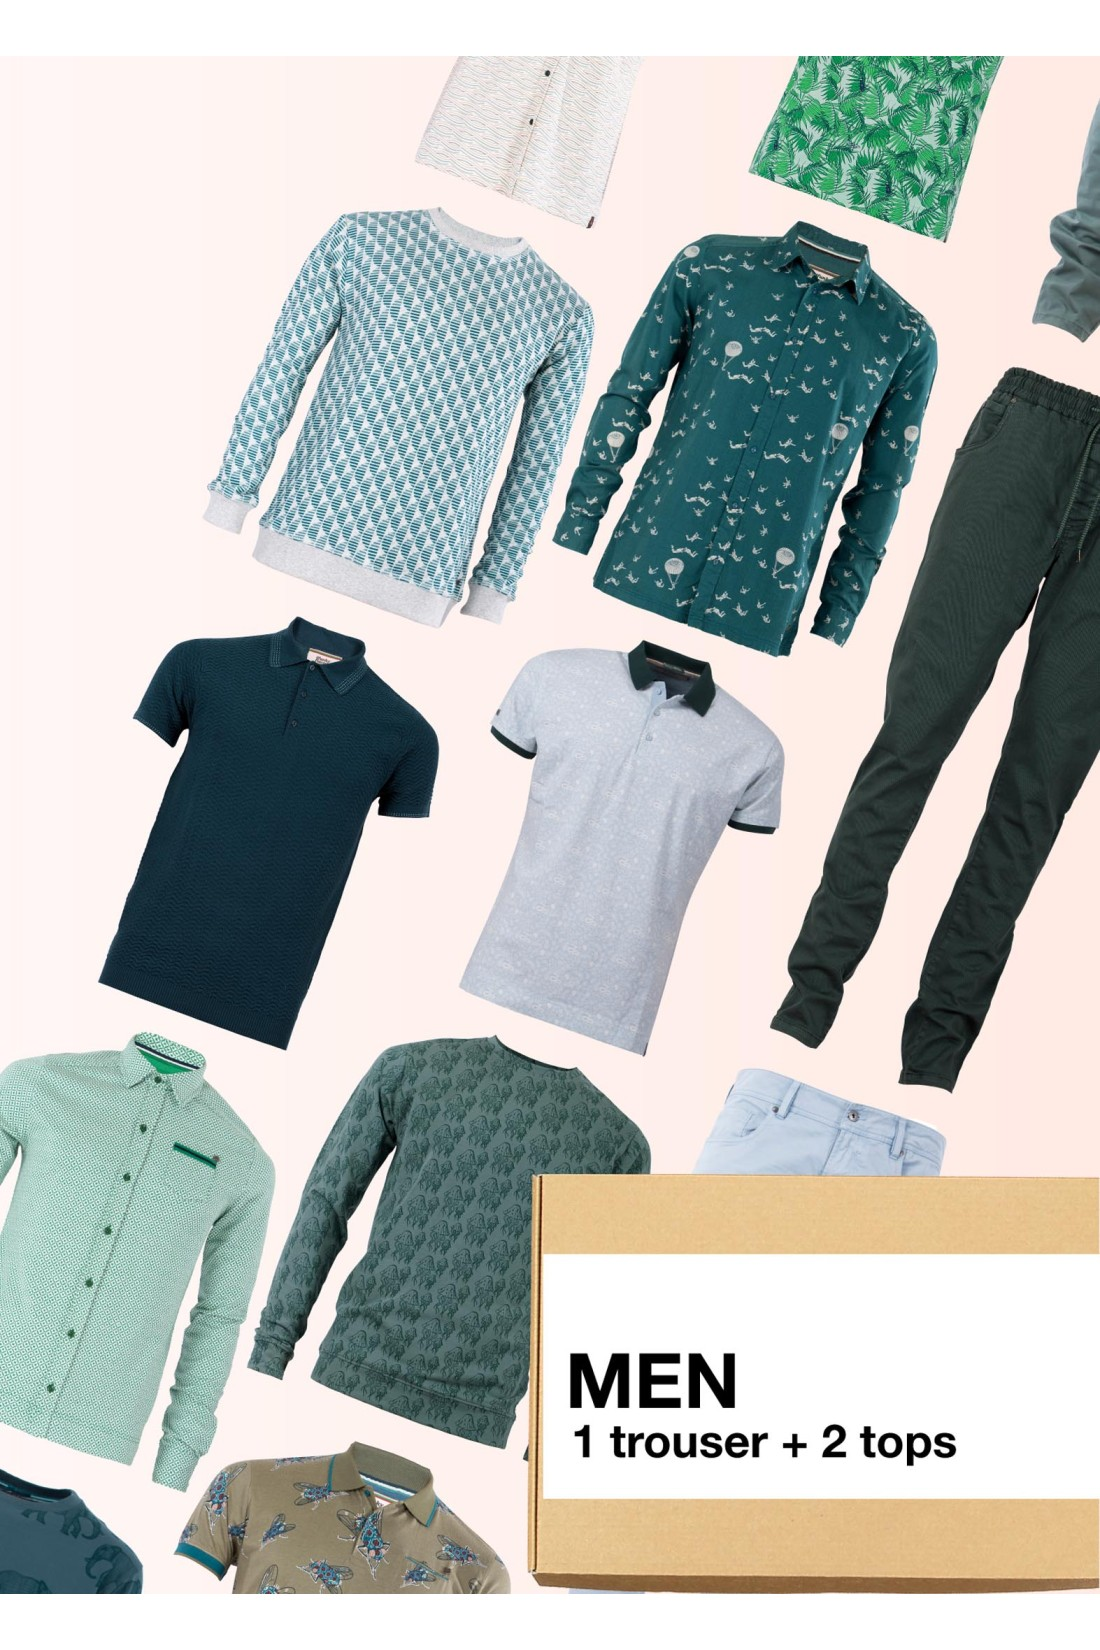 Surprise Box Men - 3 Styles - Trousers Long + 2 Tops